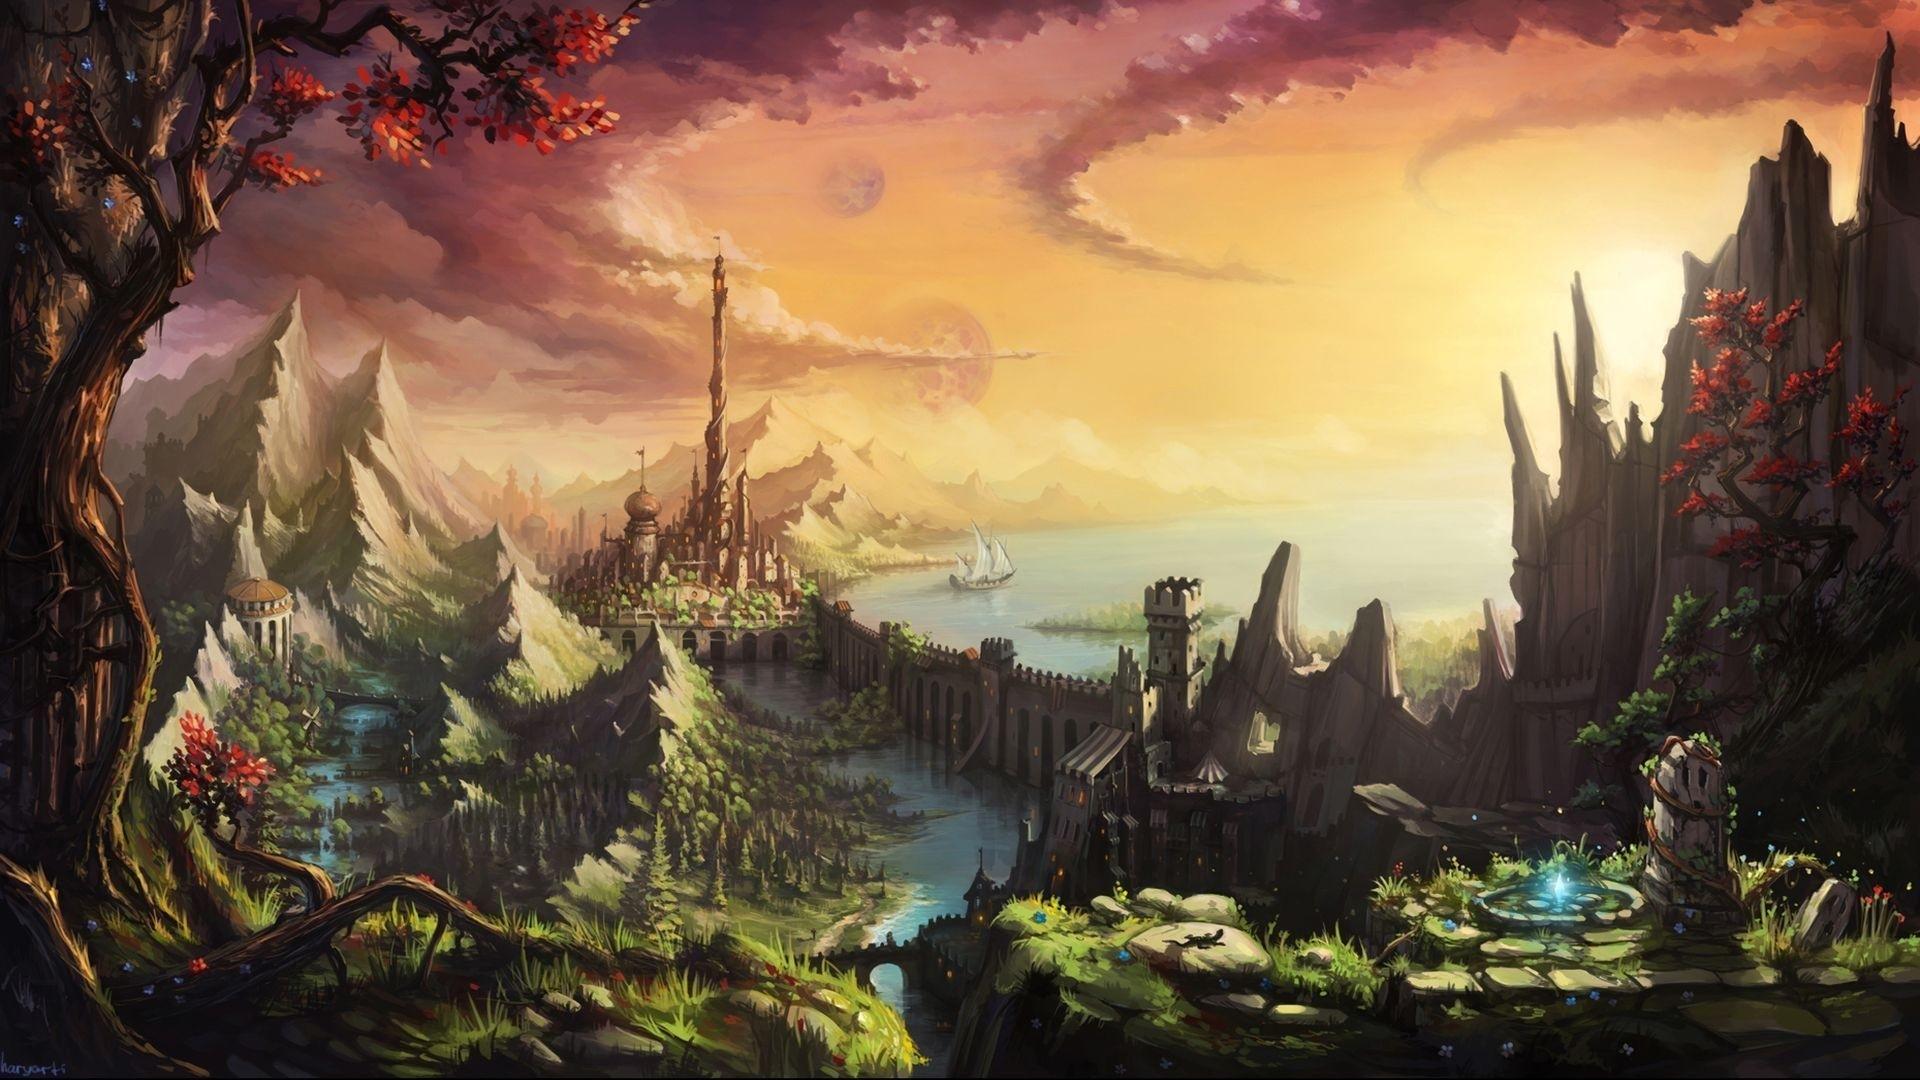 fantasy castle wallpaper hd (80+ images)